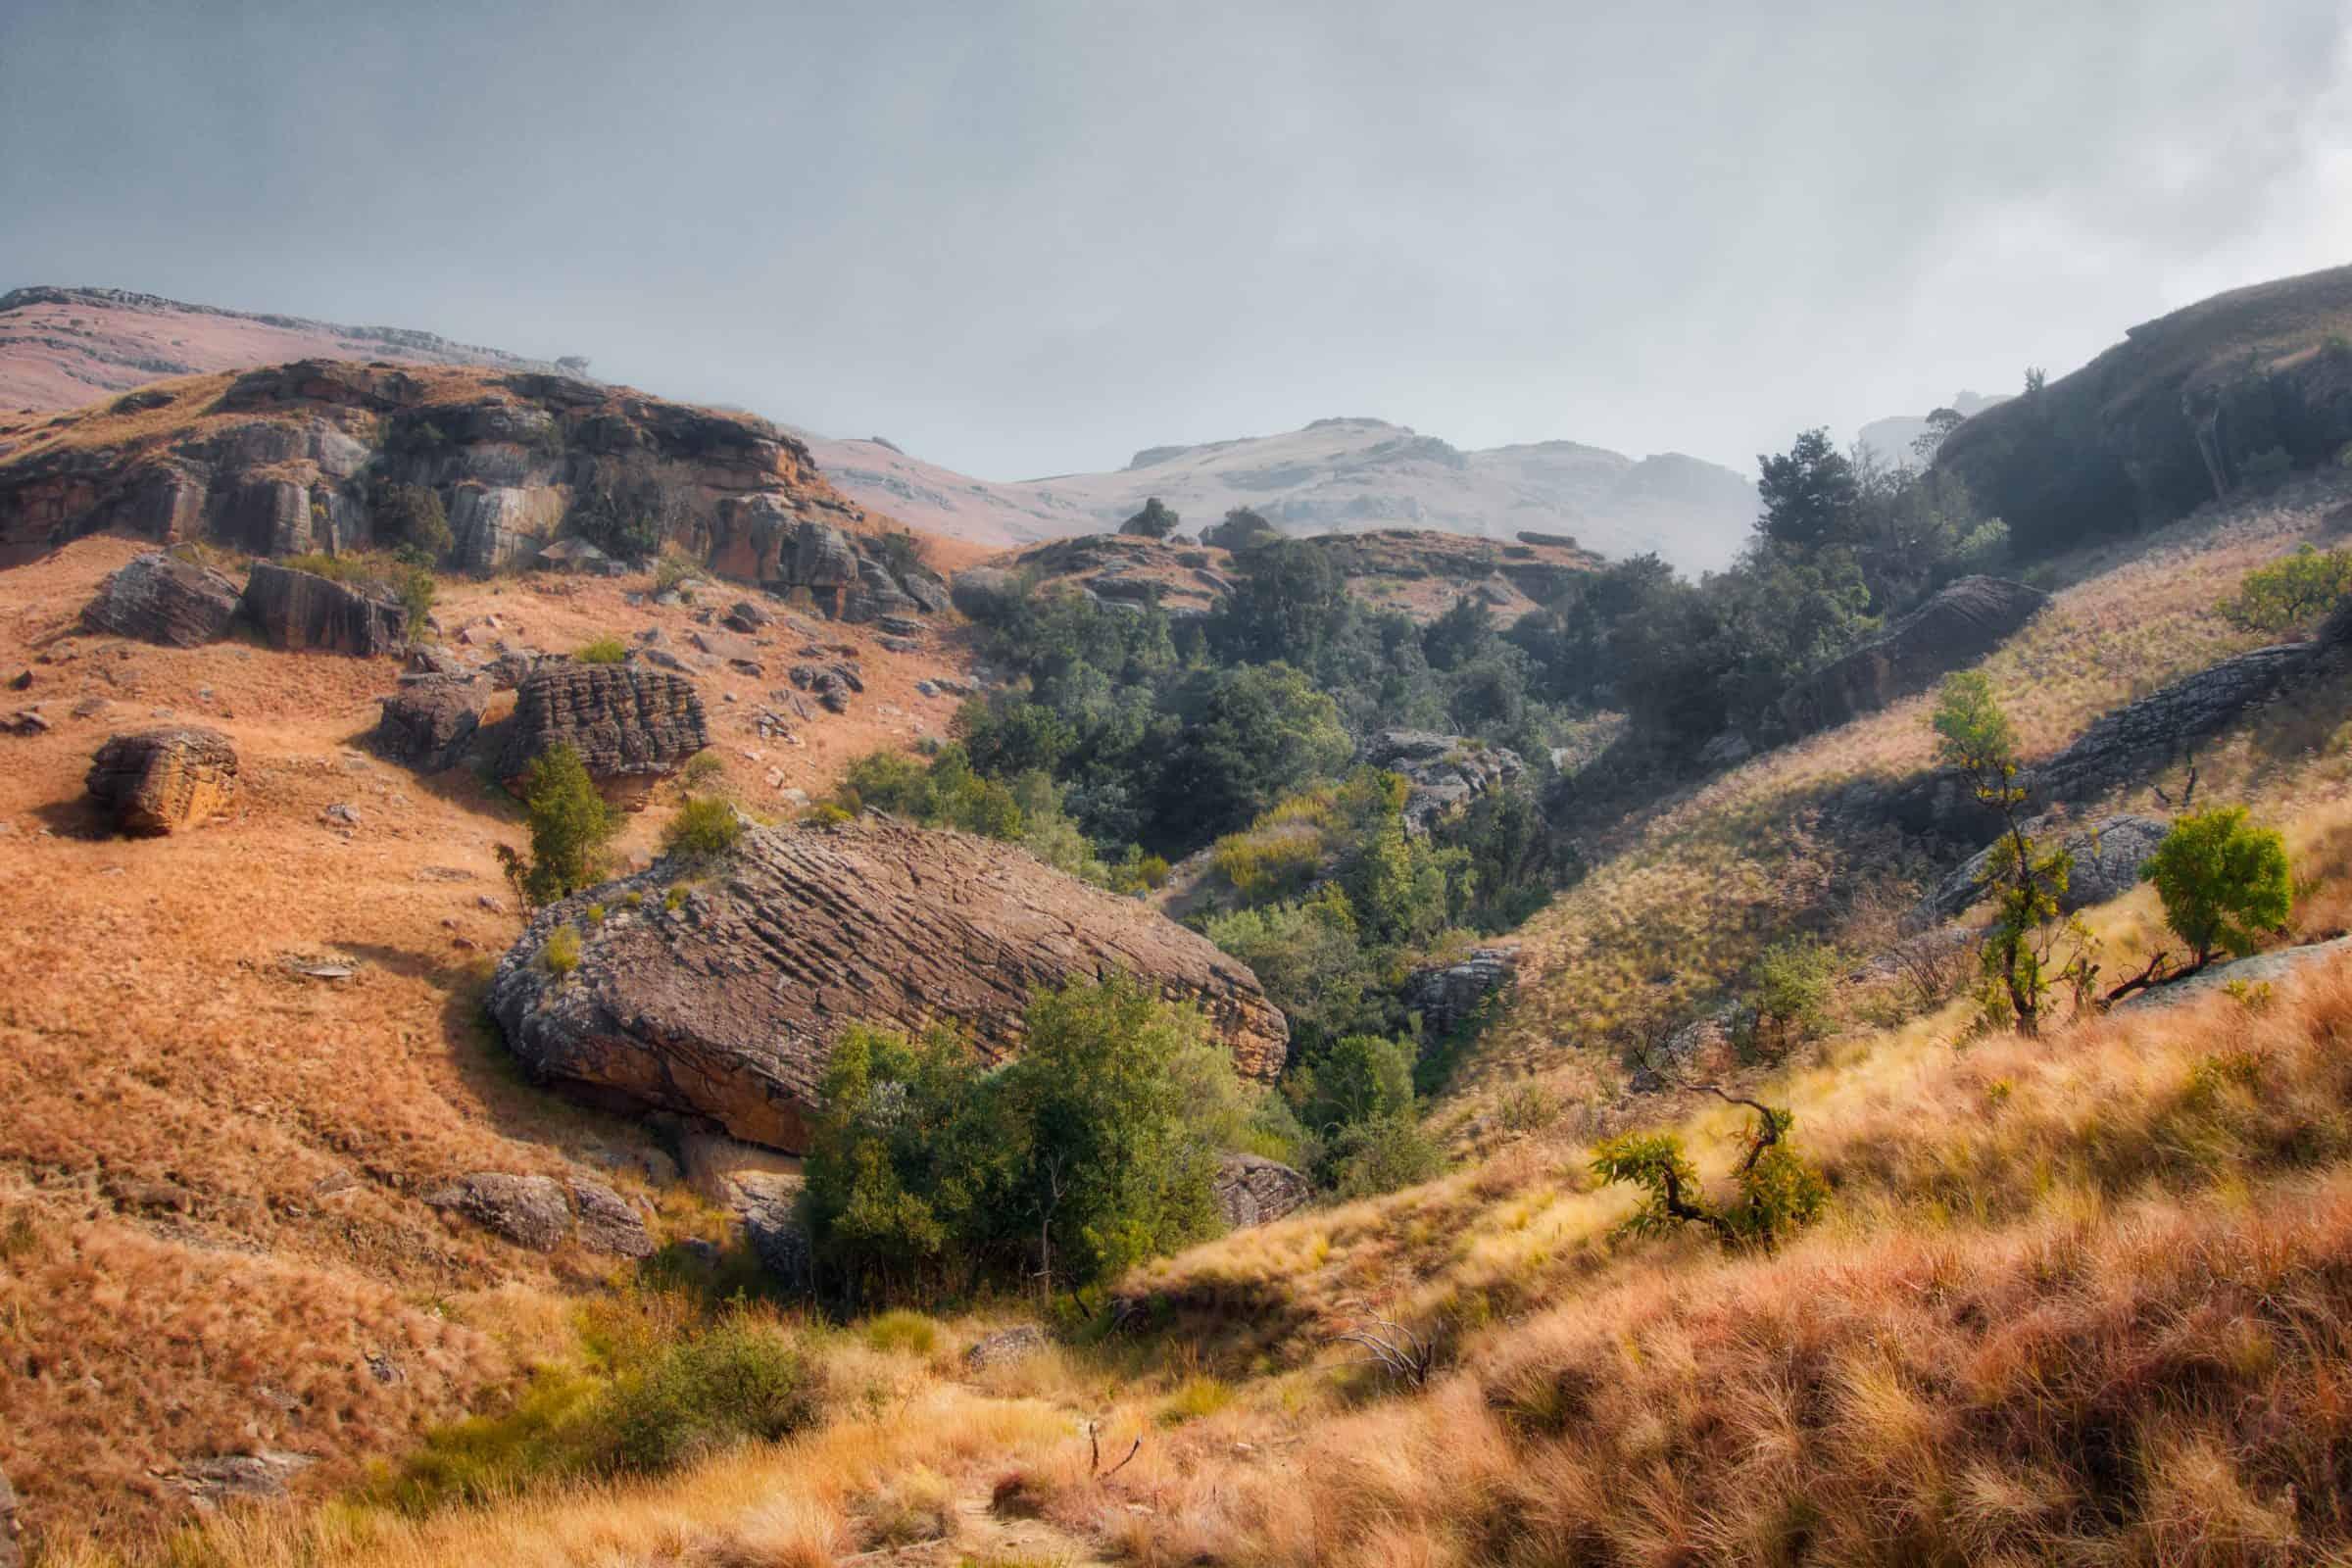 eSwatini landscape